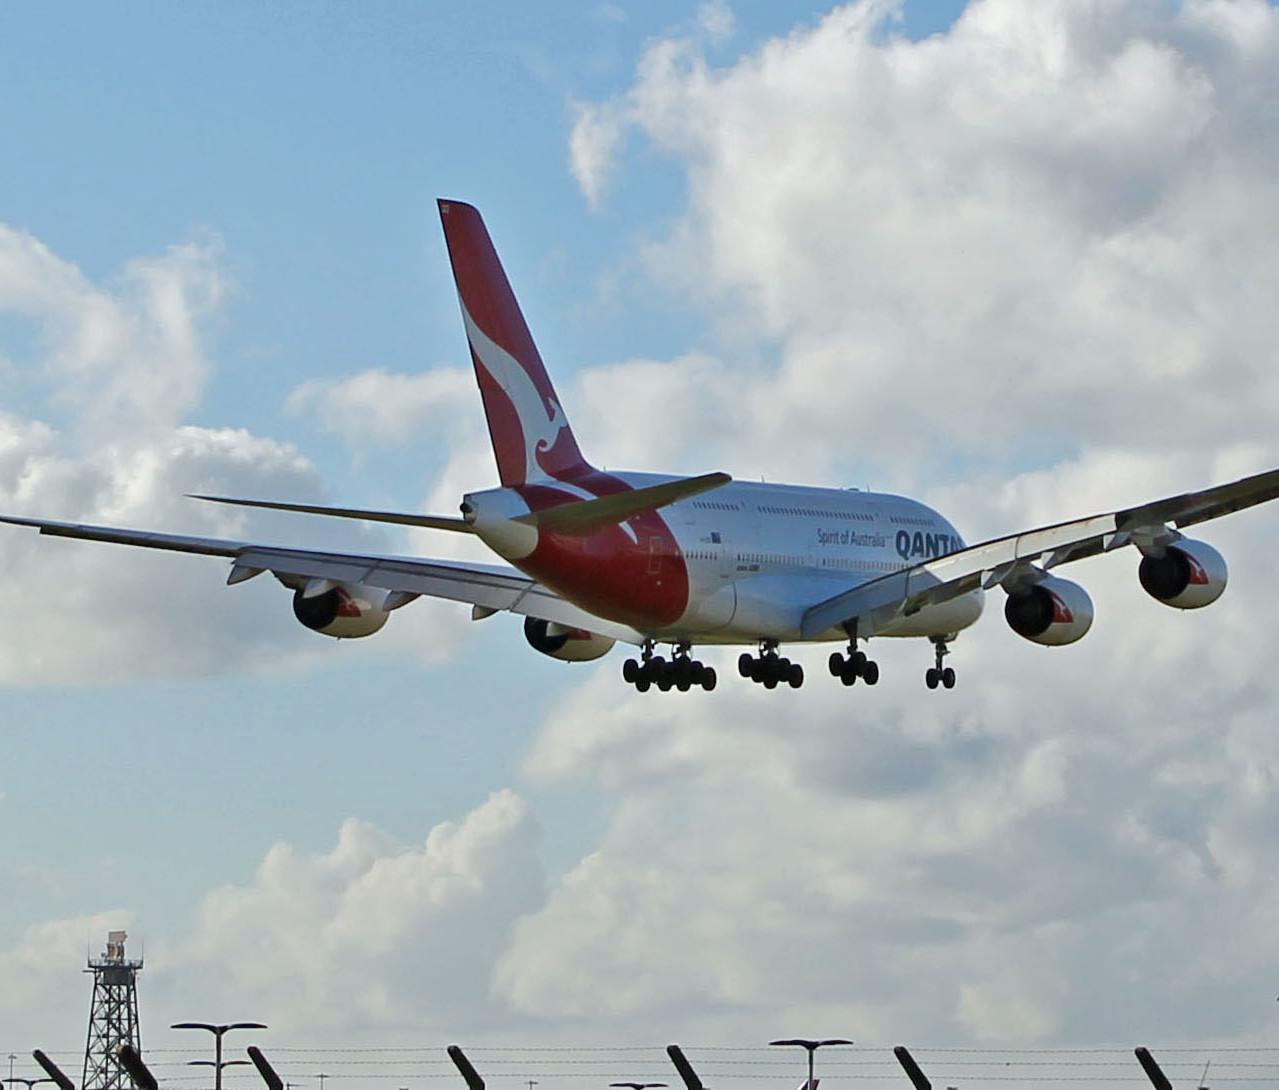 005_Giant arrival_QF A380_kevan james